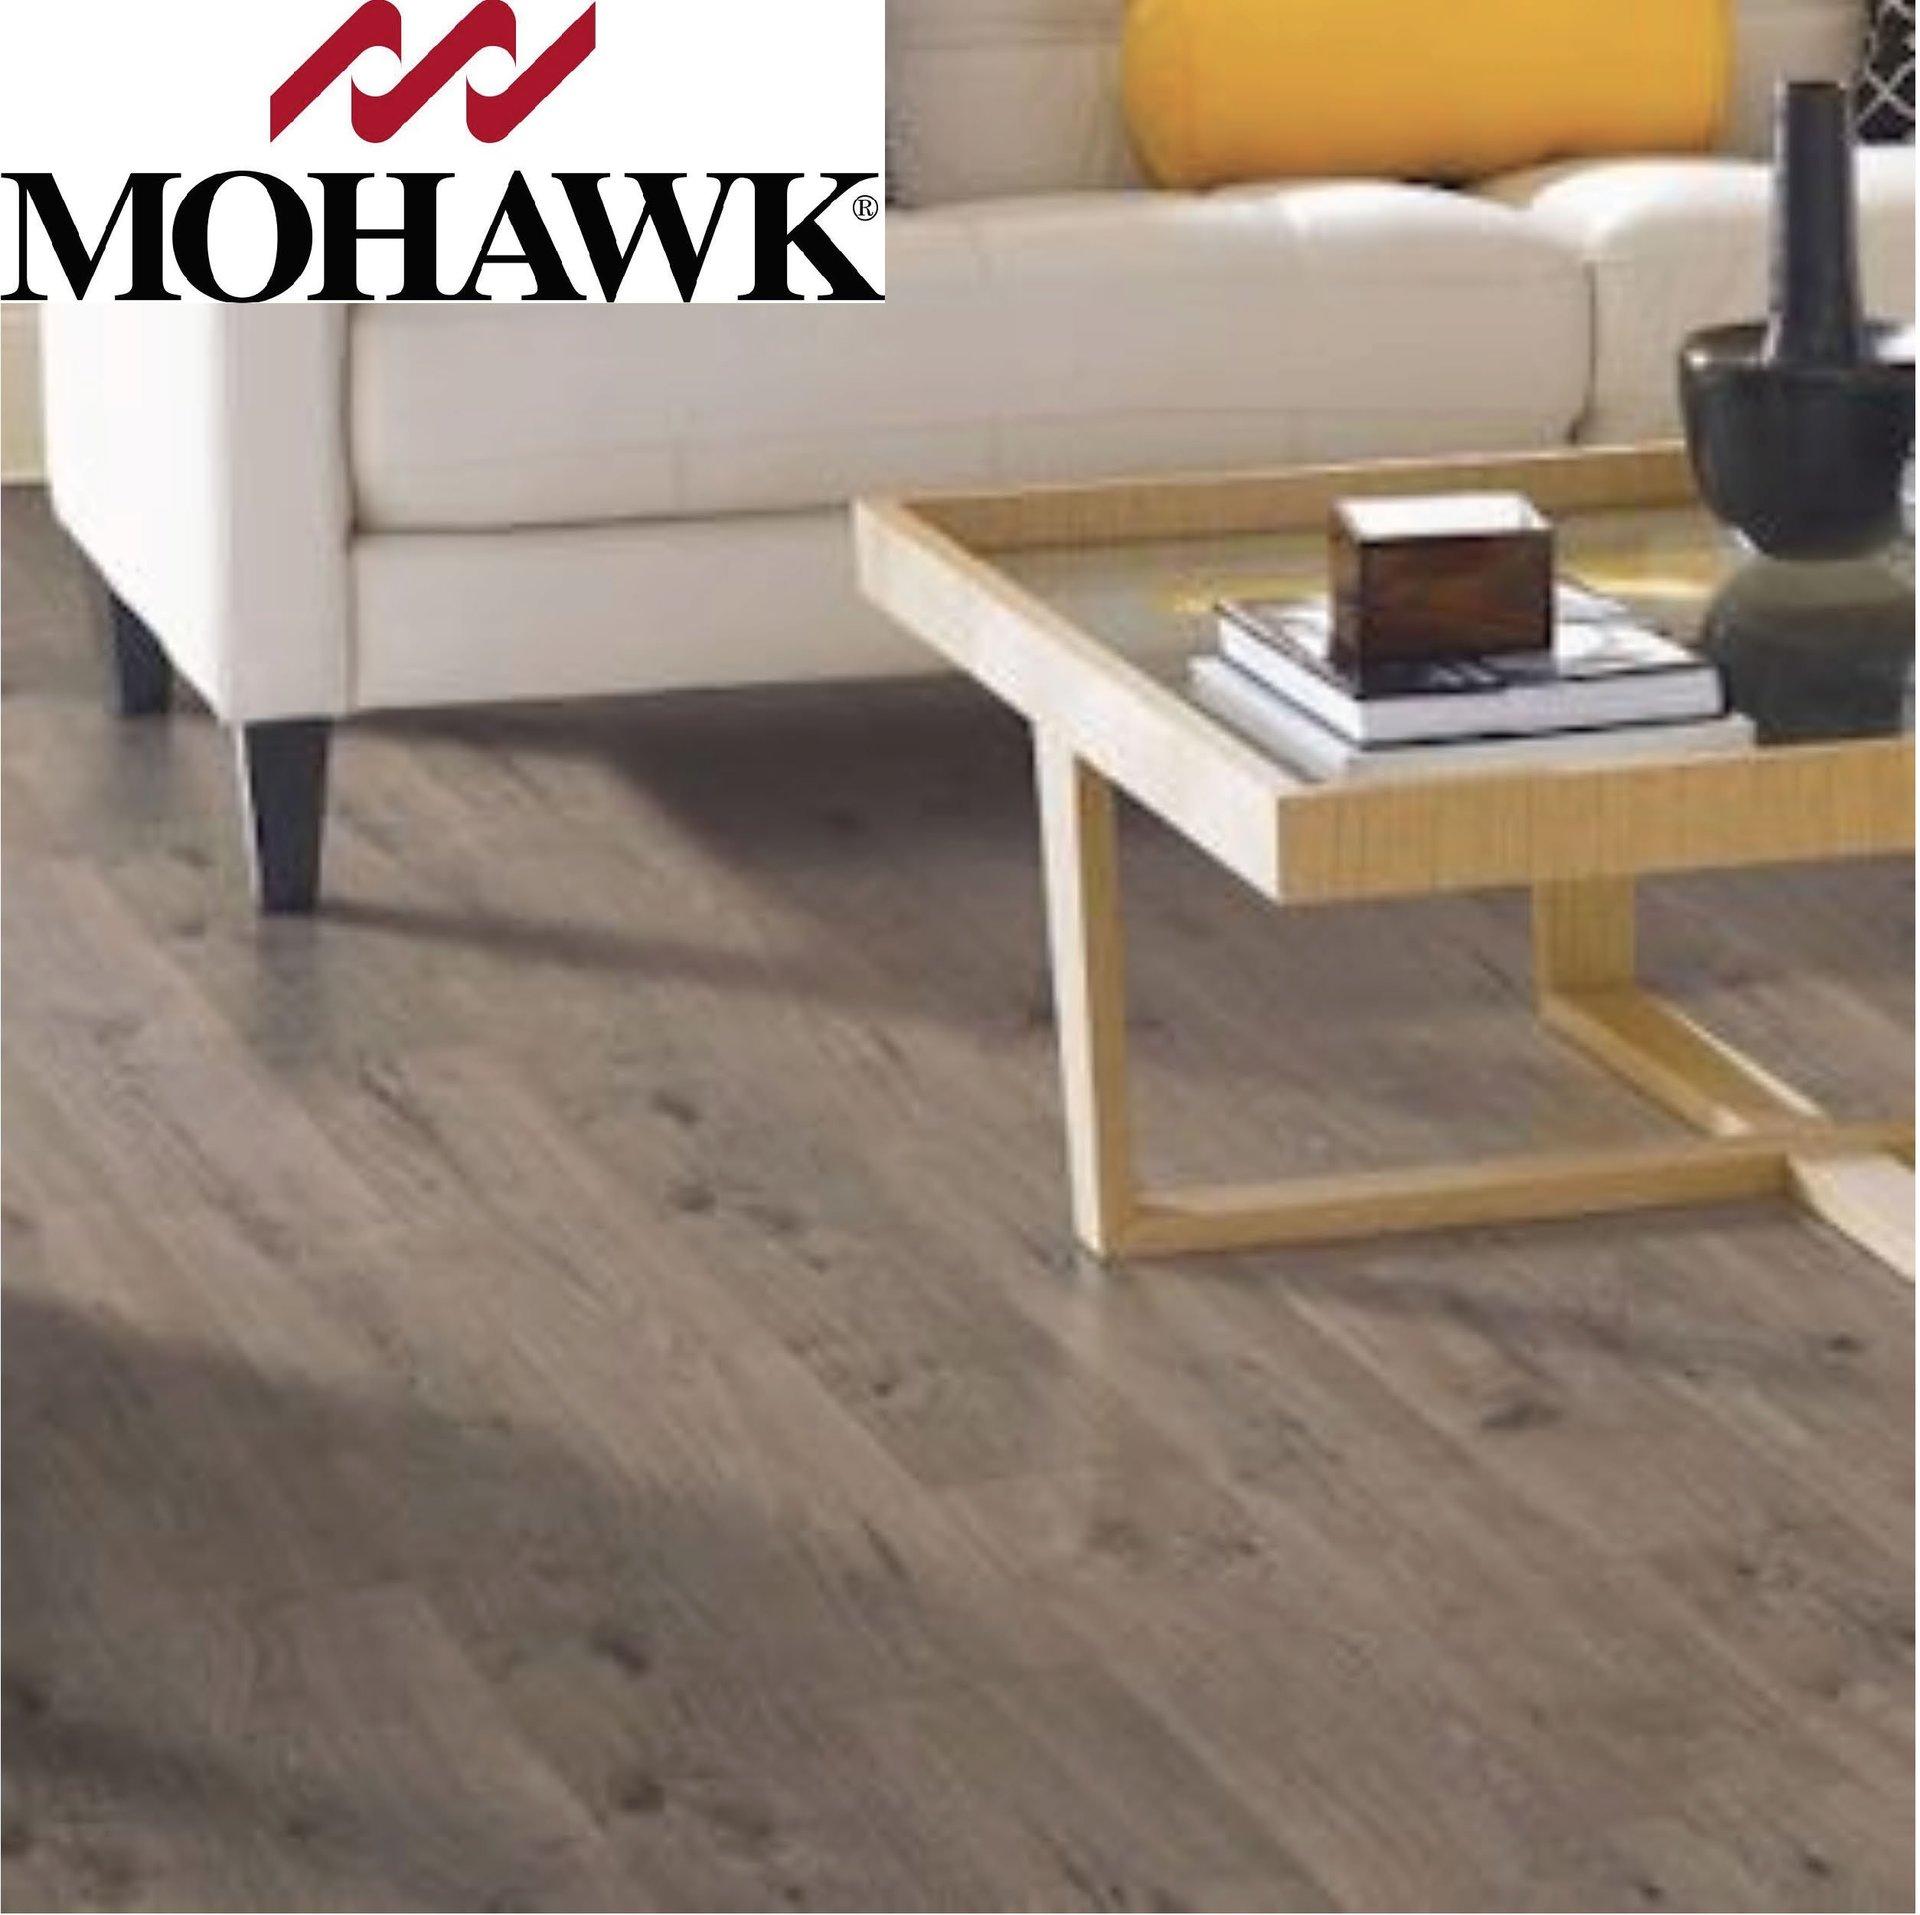 Mohawk laminate